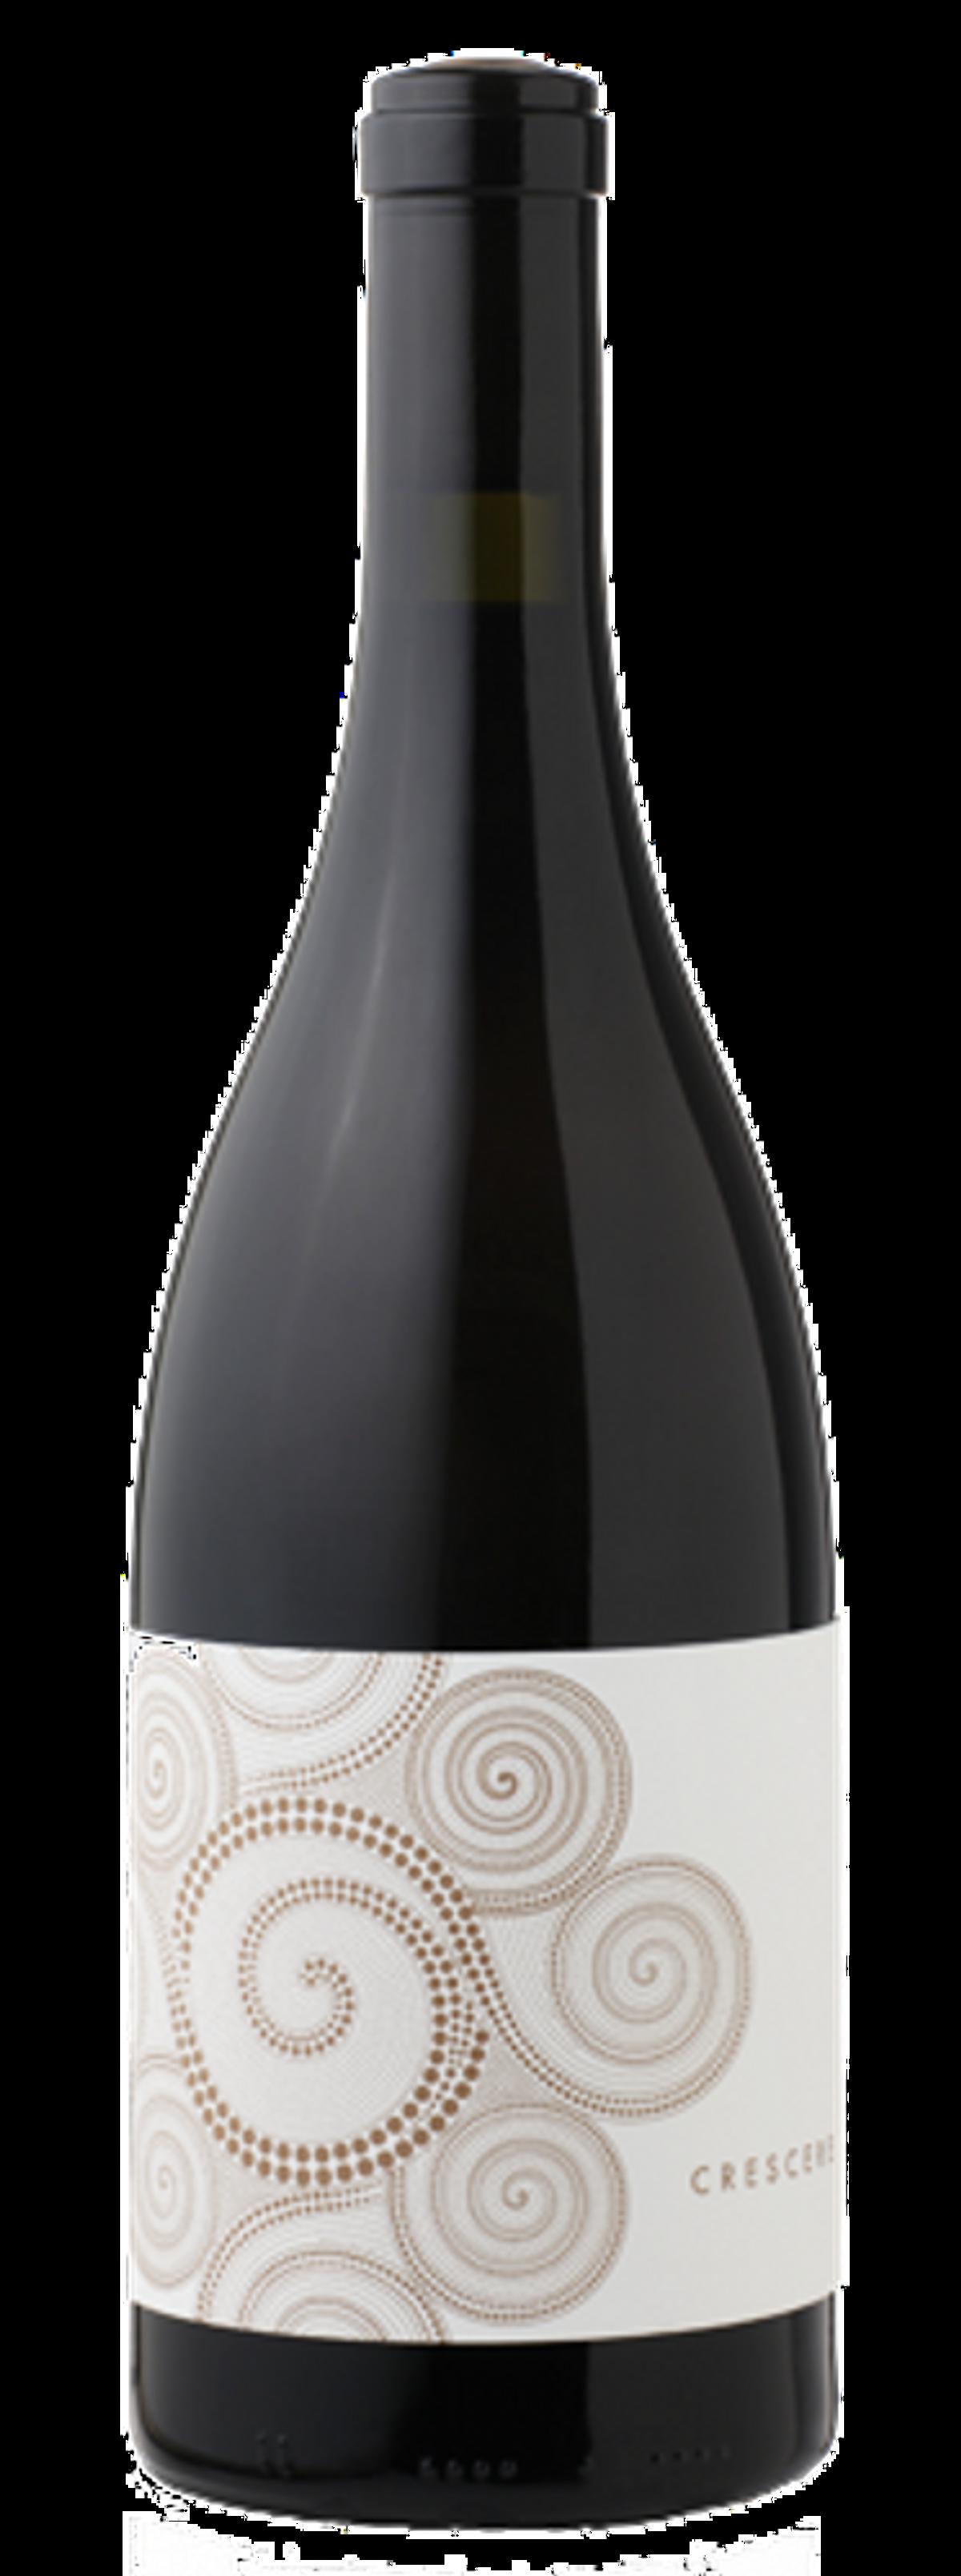 crescere wines 2016 estate syrah